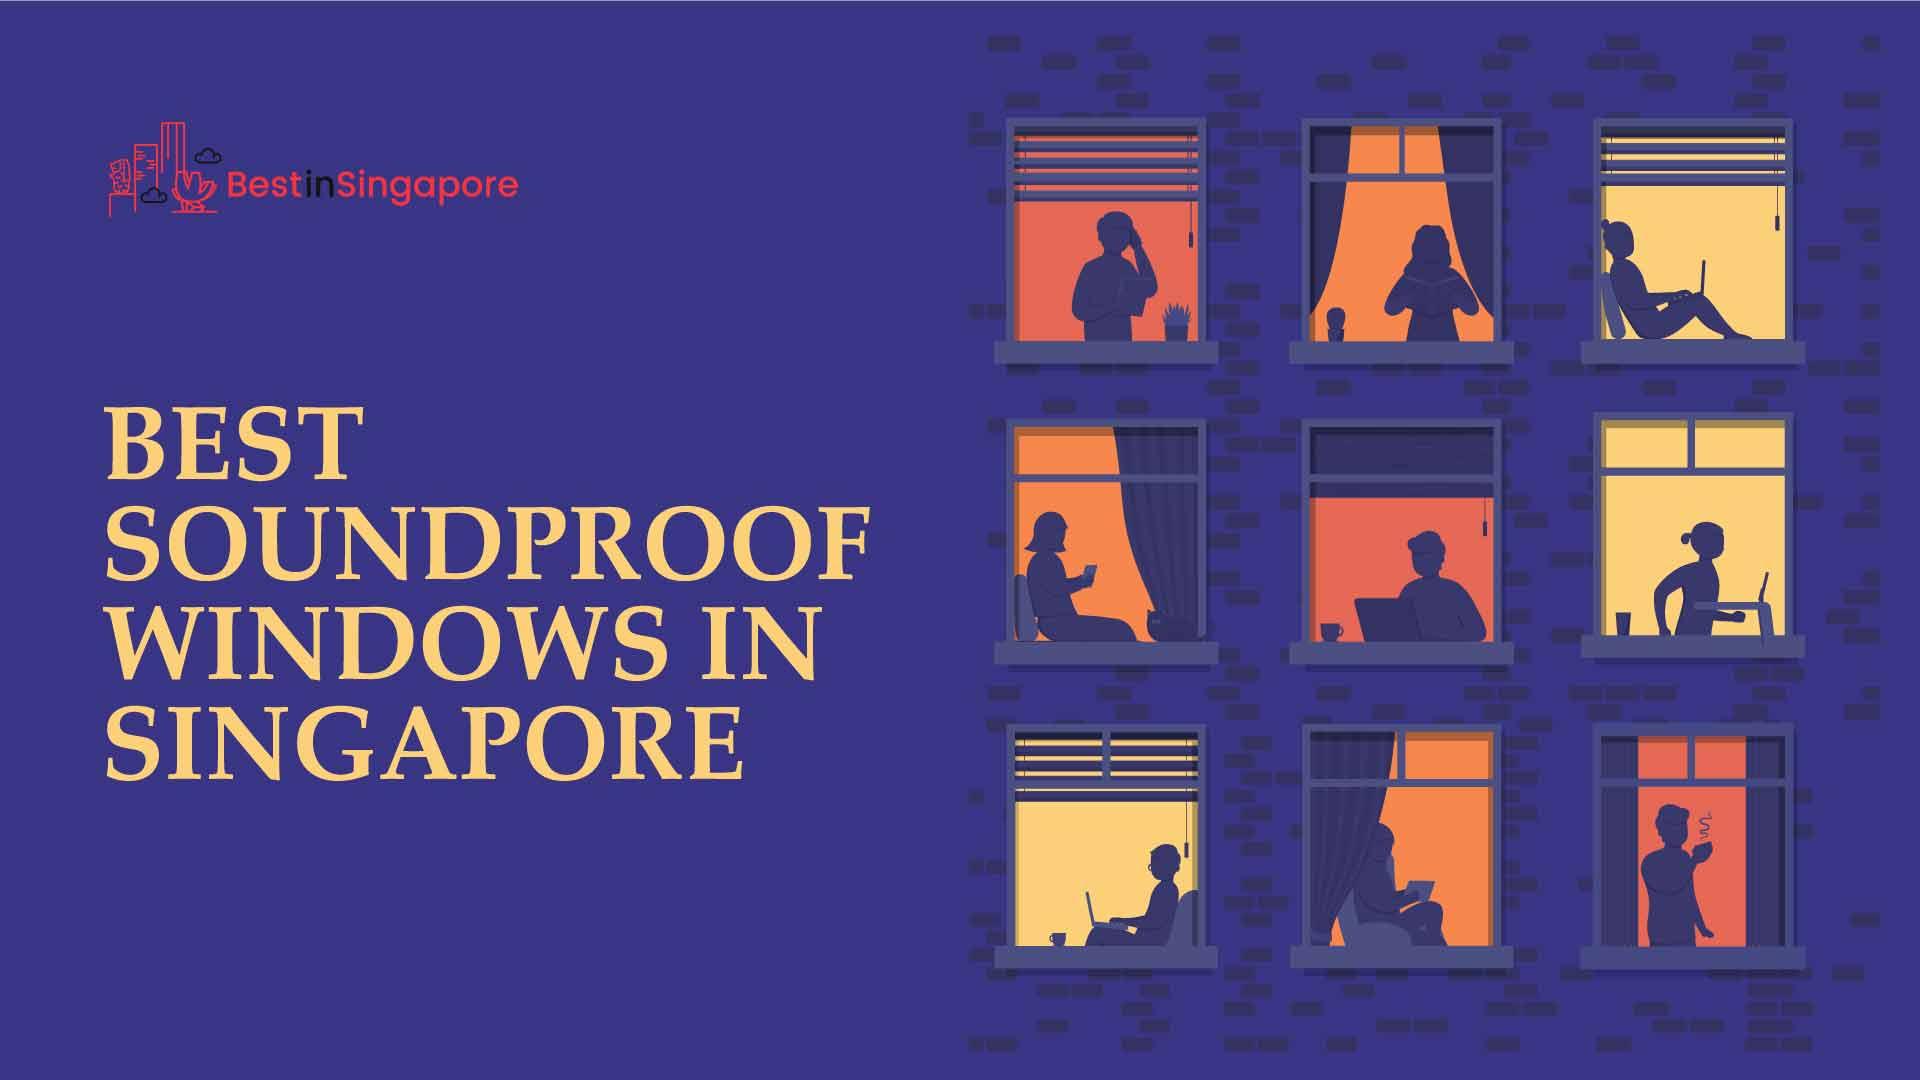 Best Soundproof Windows in Singapore